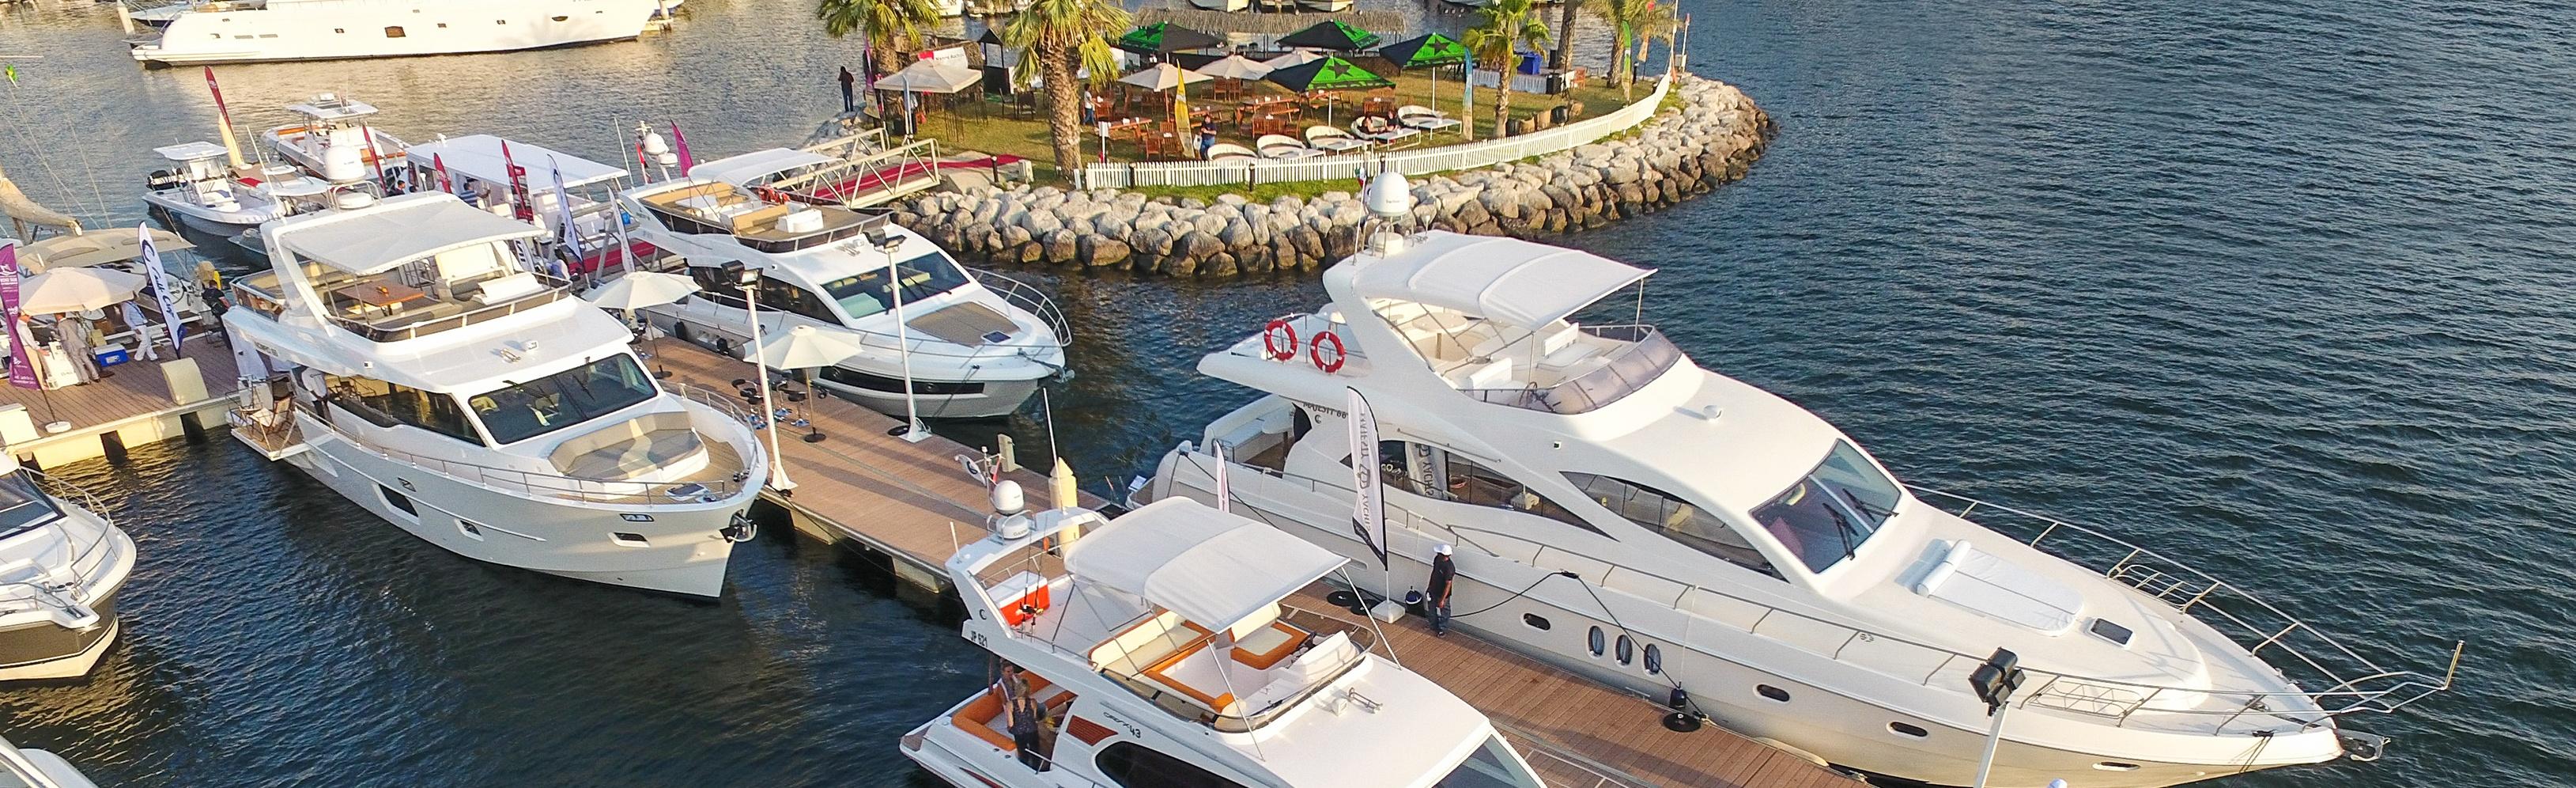 Dubai-Pre-owned-Boat-Show-2017.jpg